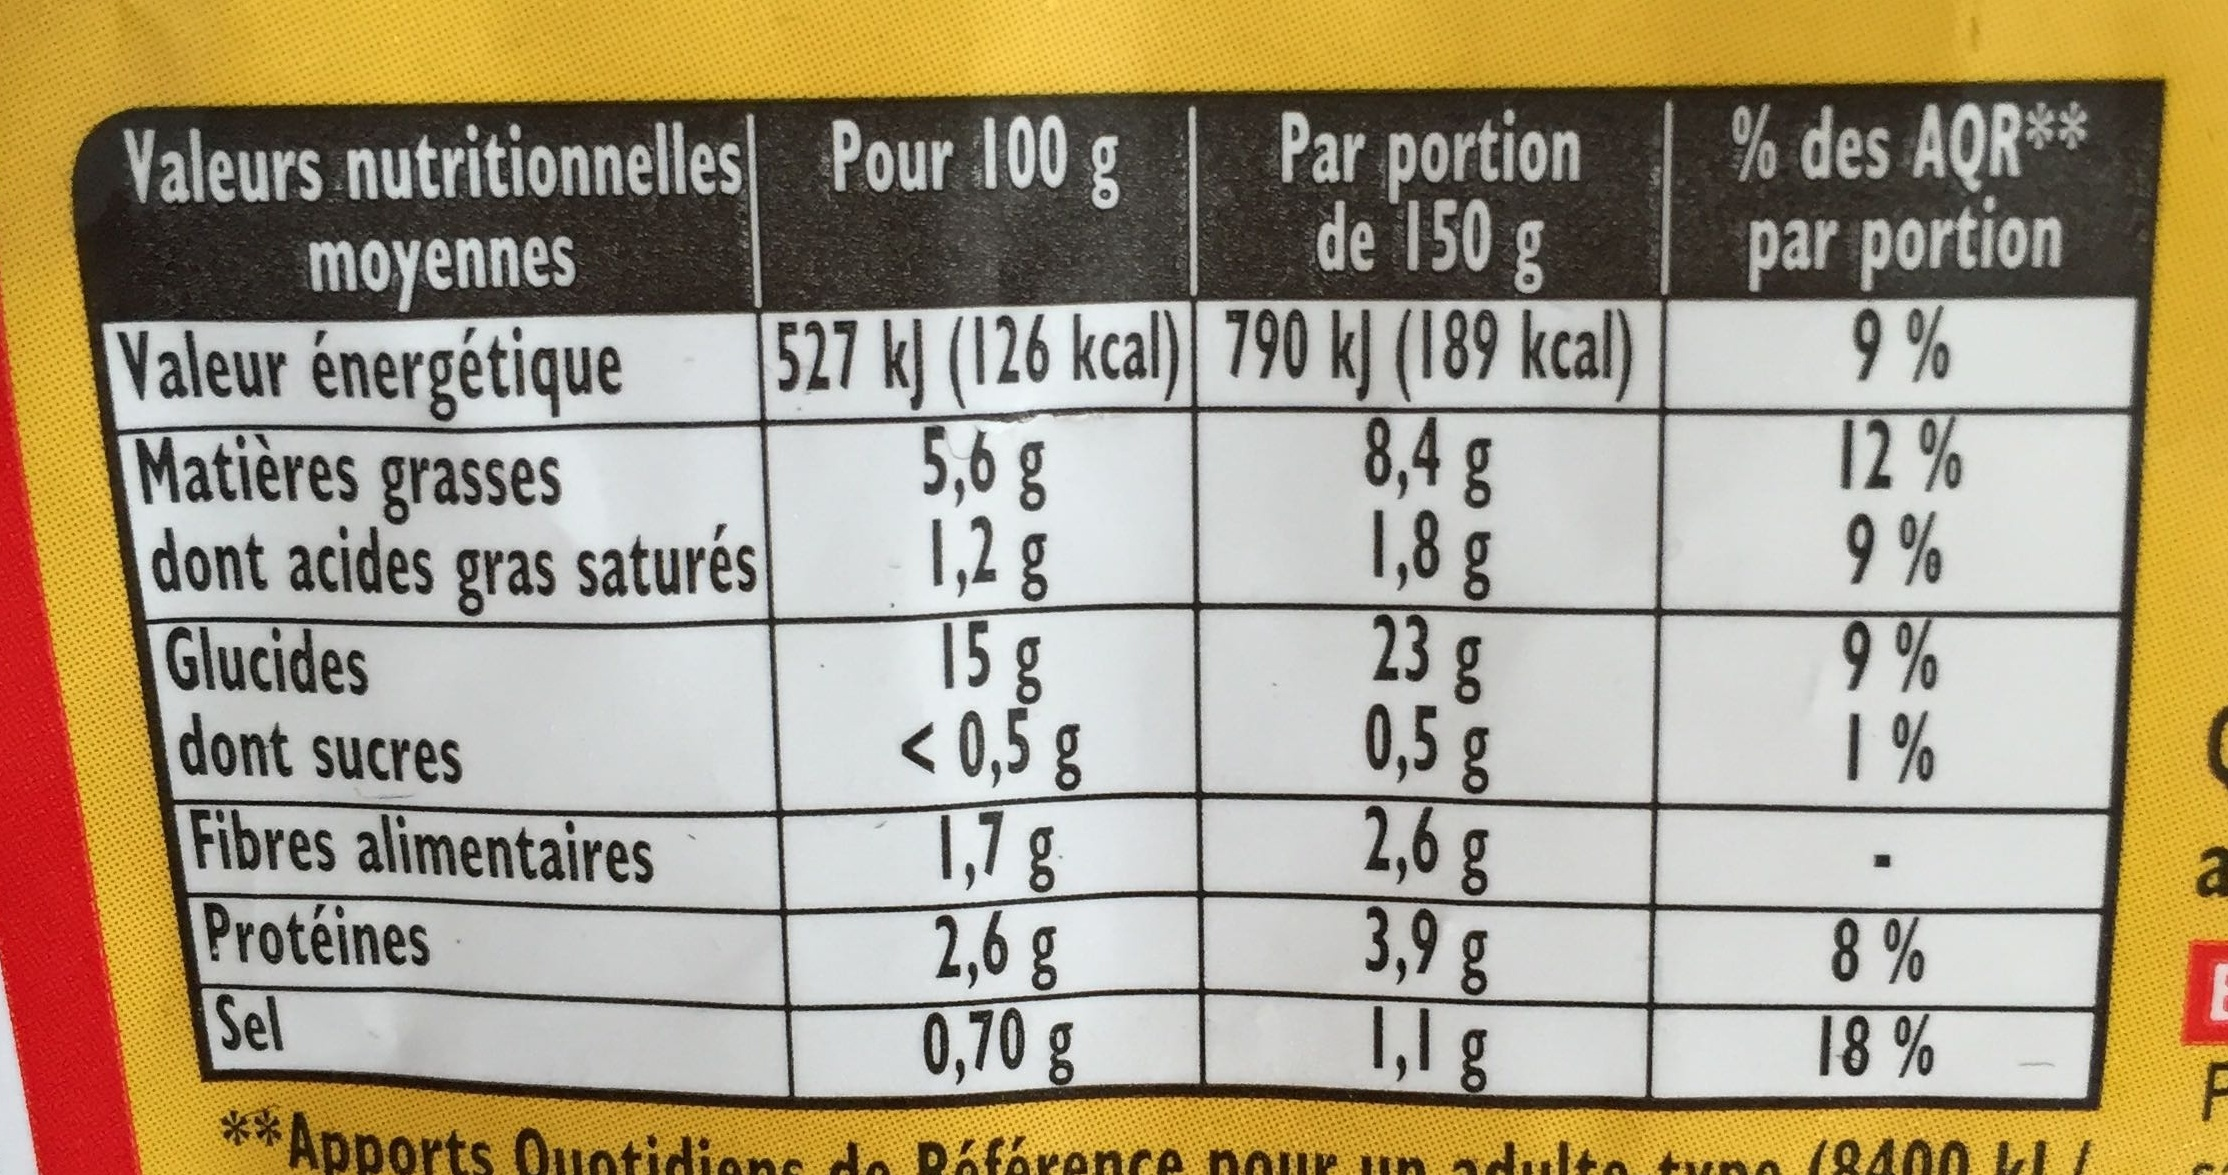 Pommes rissolées au fromage - Voedingswaarden